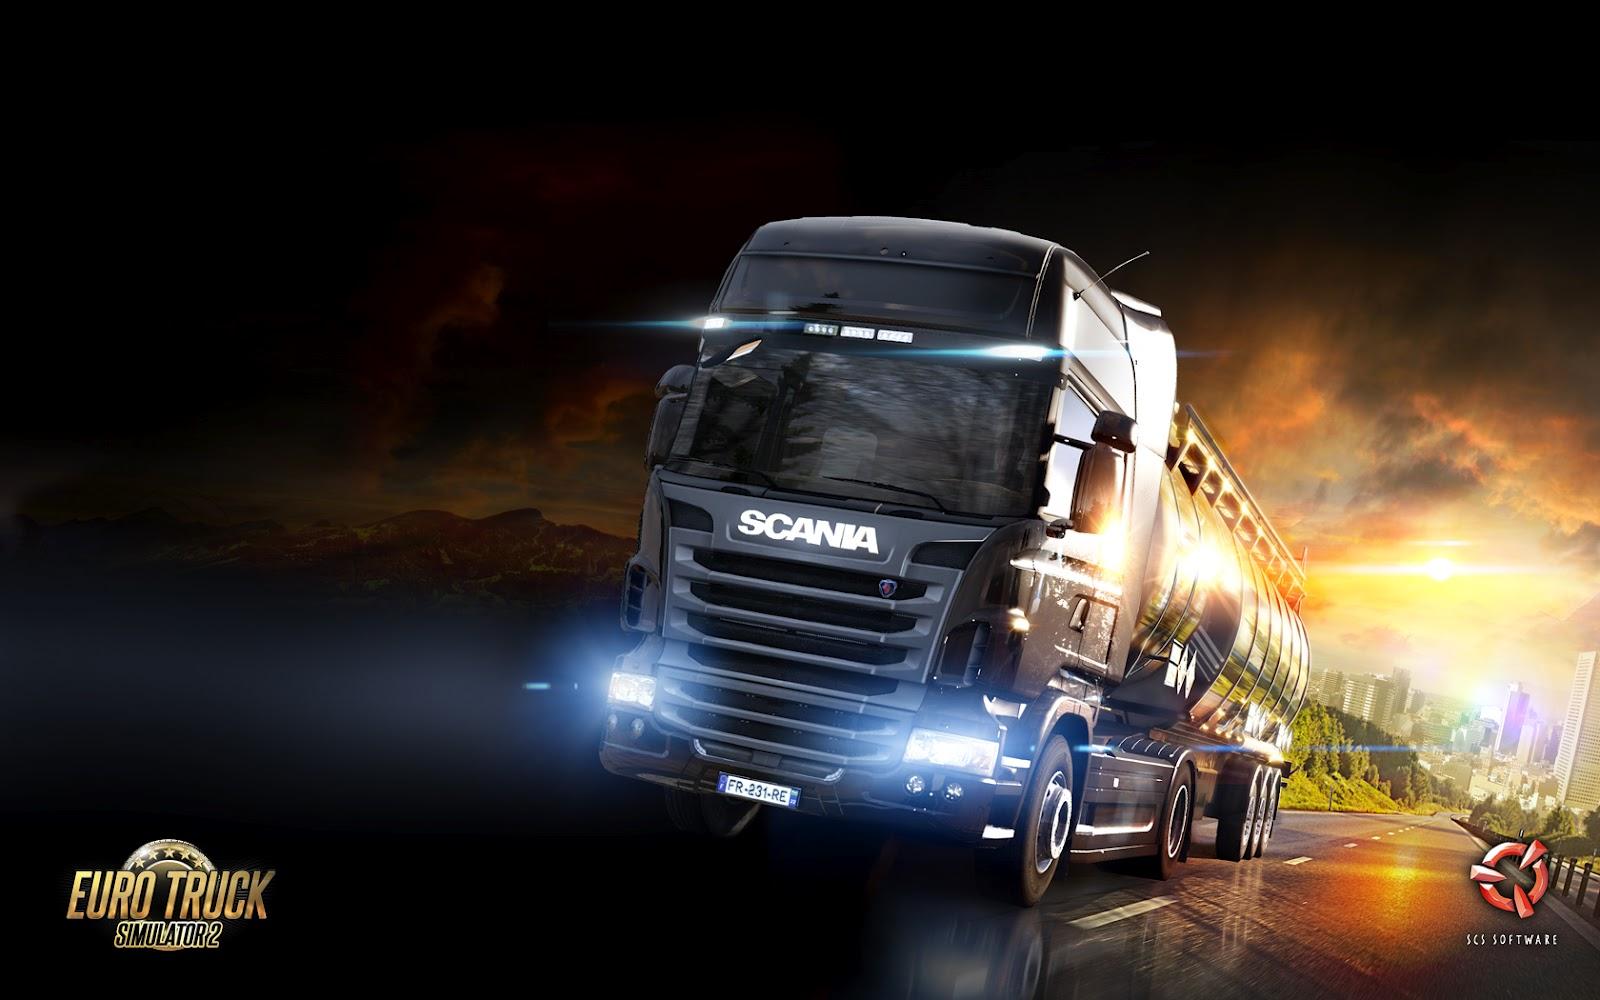 Scs Softwares Blog Euro Truck Simulator 2 Wallpaper